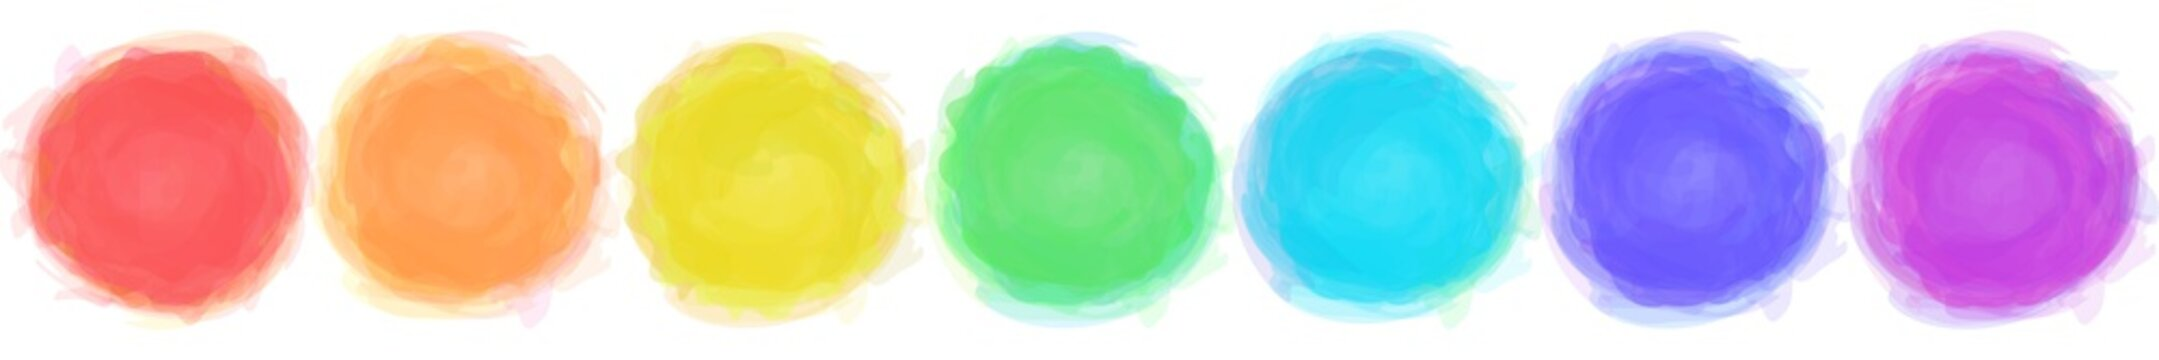 Watercolor motley circles set. Smoky frames. Colorful templates. 7 rainbow colors